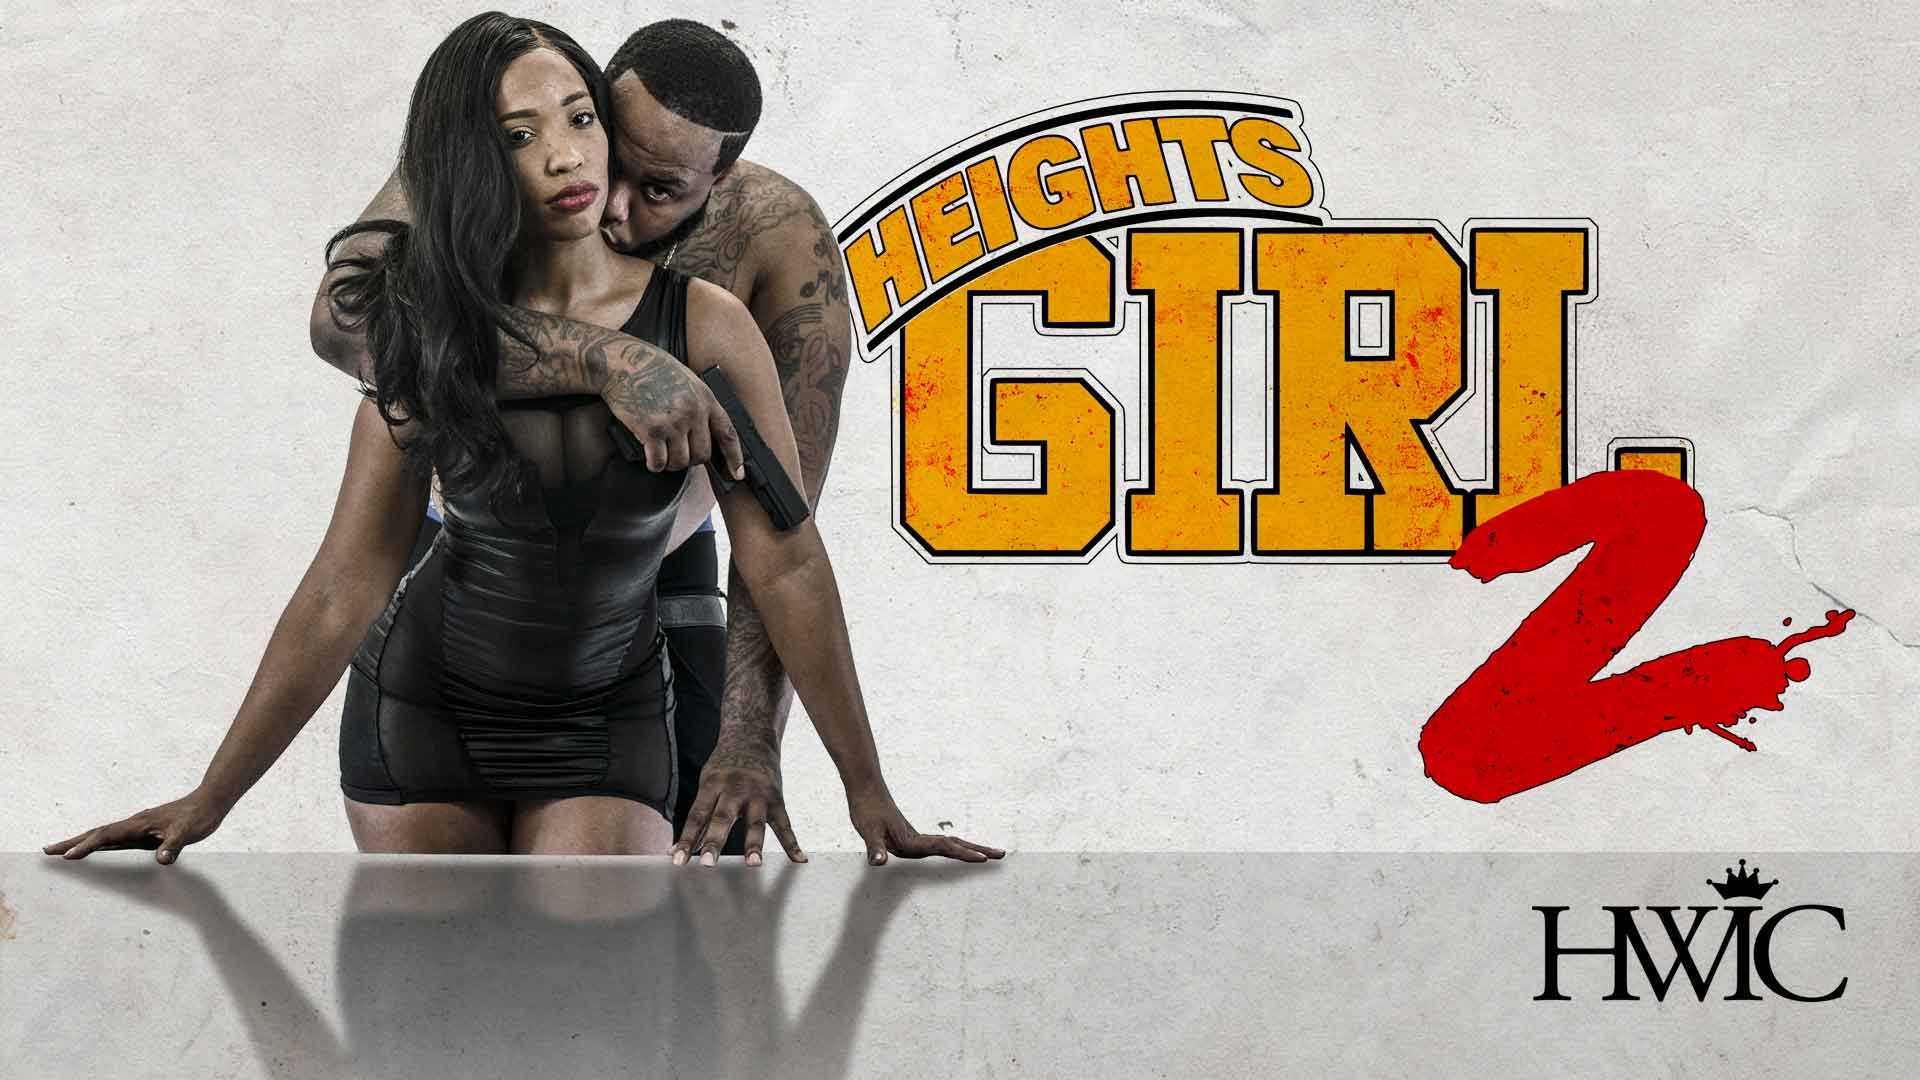 Heights Girl 2